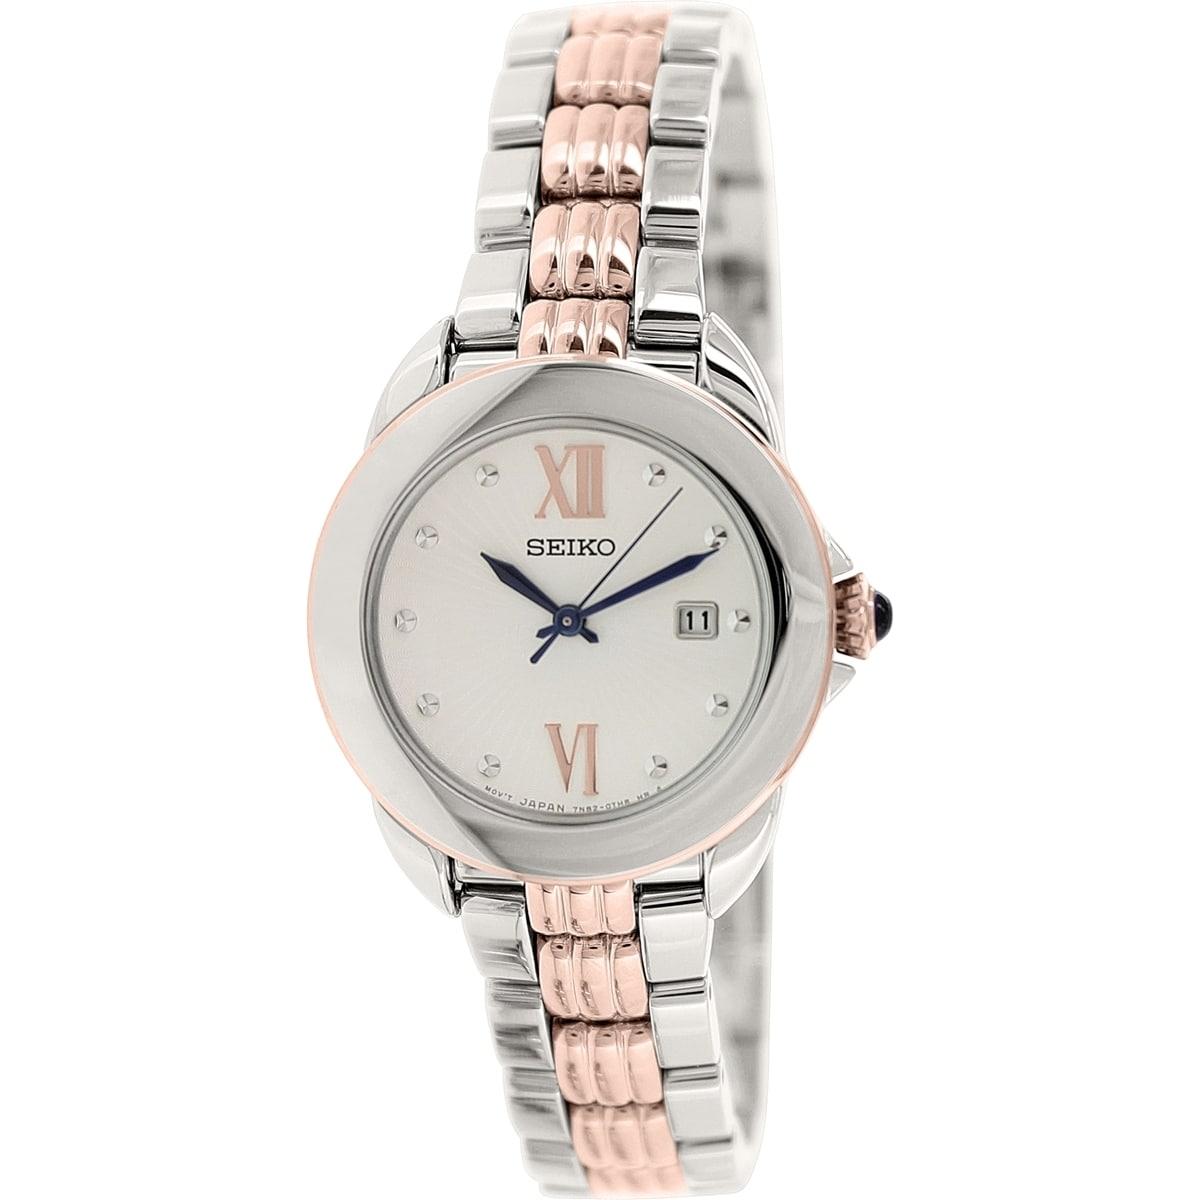 Seiko Women's SXDF62 Stainless Steel Quartz Watch (SXDF62...